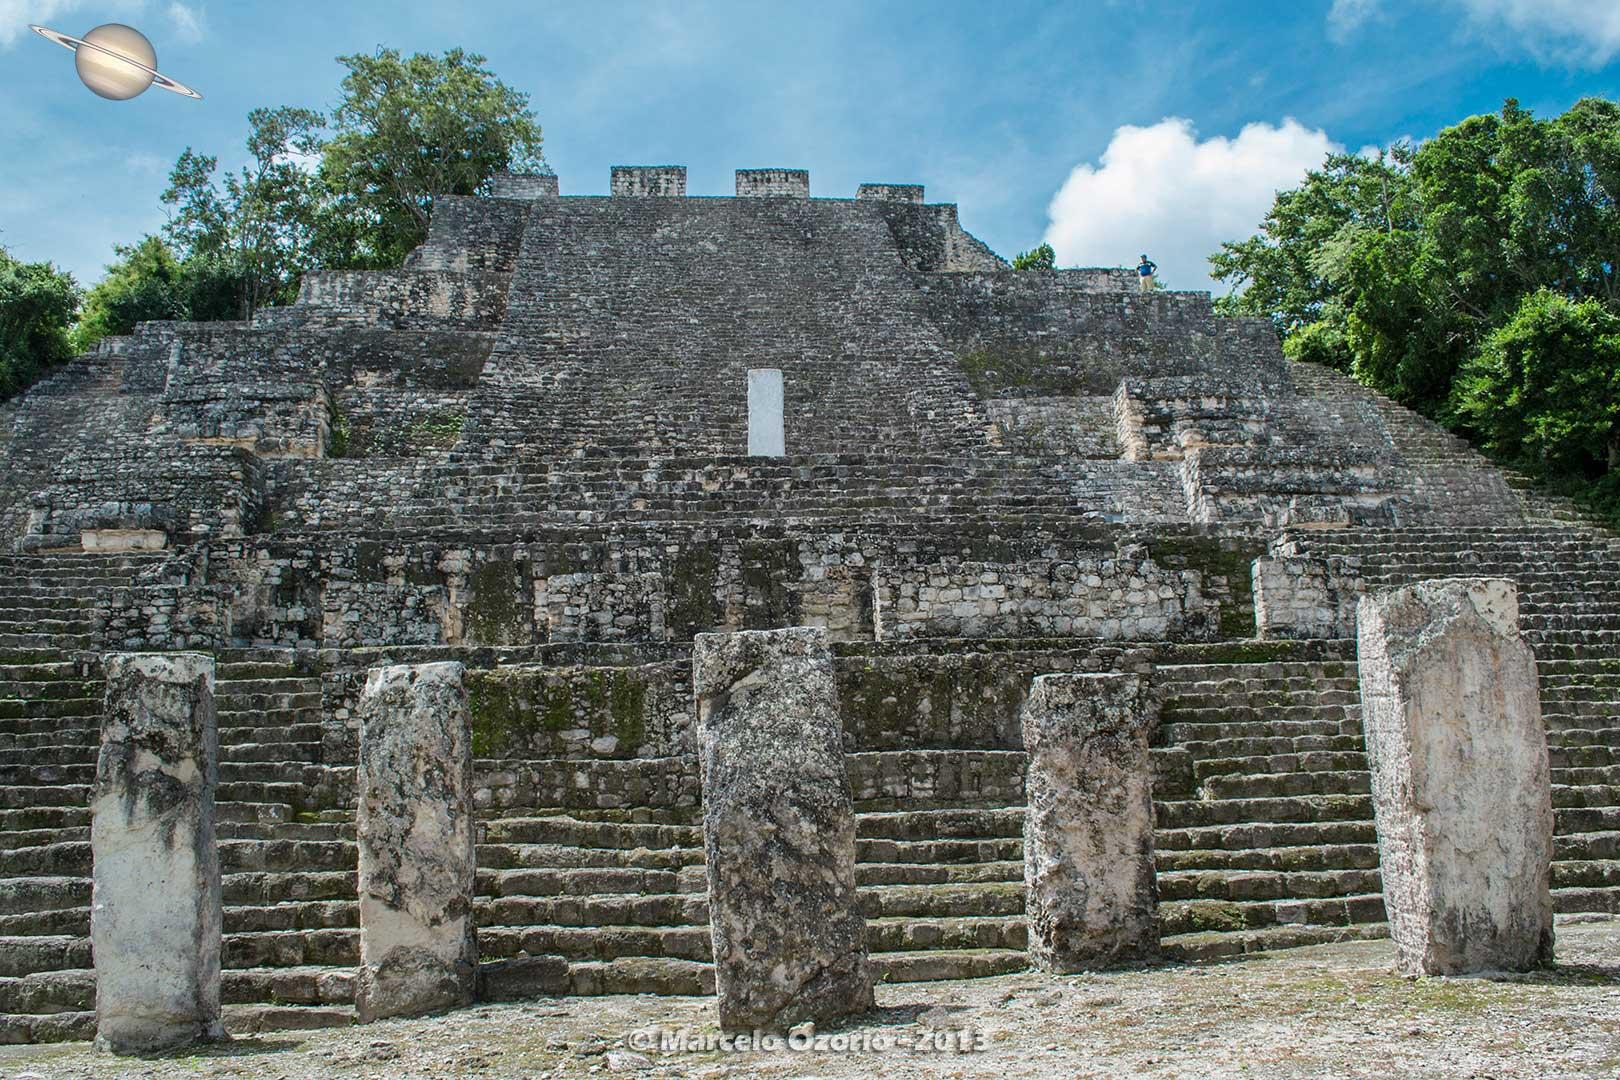 calakmul mayan civilization mexico 39 - Calakmul, City of the Two Adjacent Pyramids - Mexico